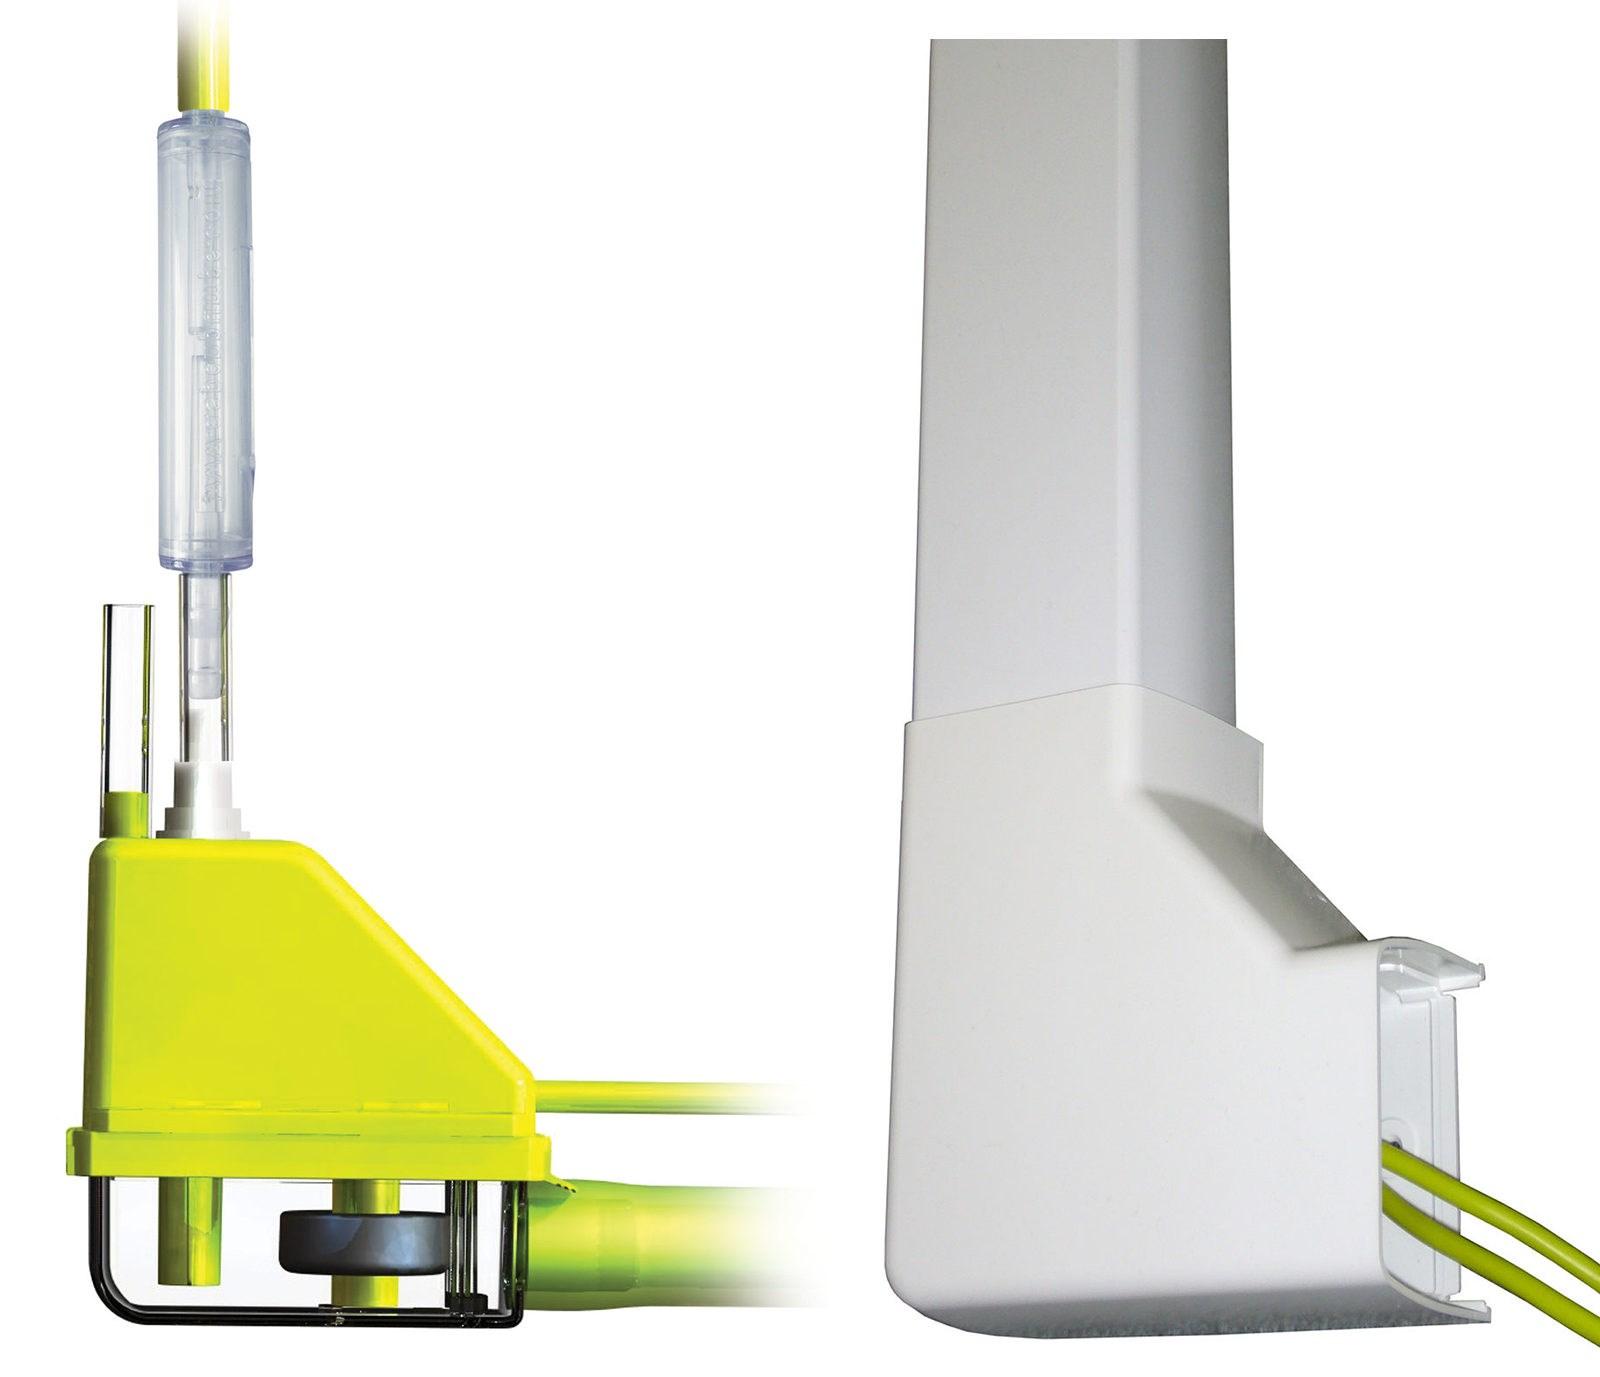 pompe de relevage mini verte optimal silence salina. Black Bedroom Furniture Sets. Home Design Ideas